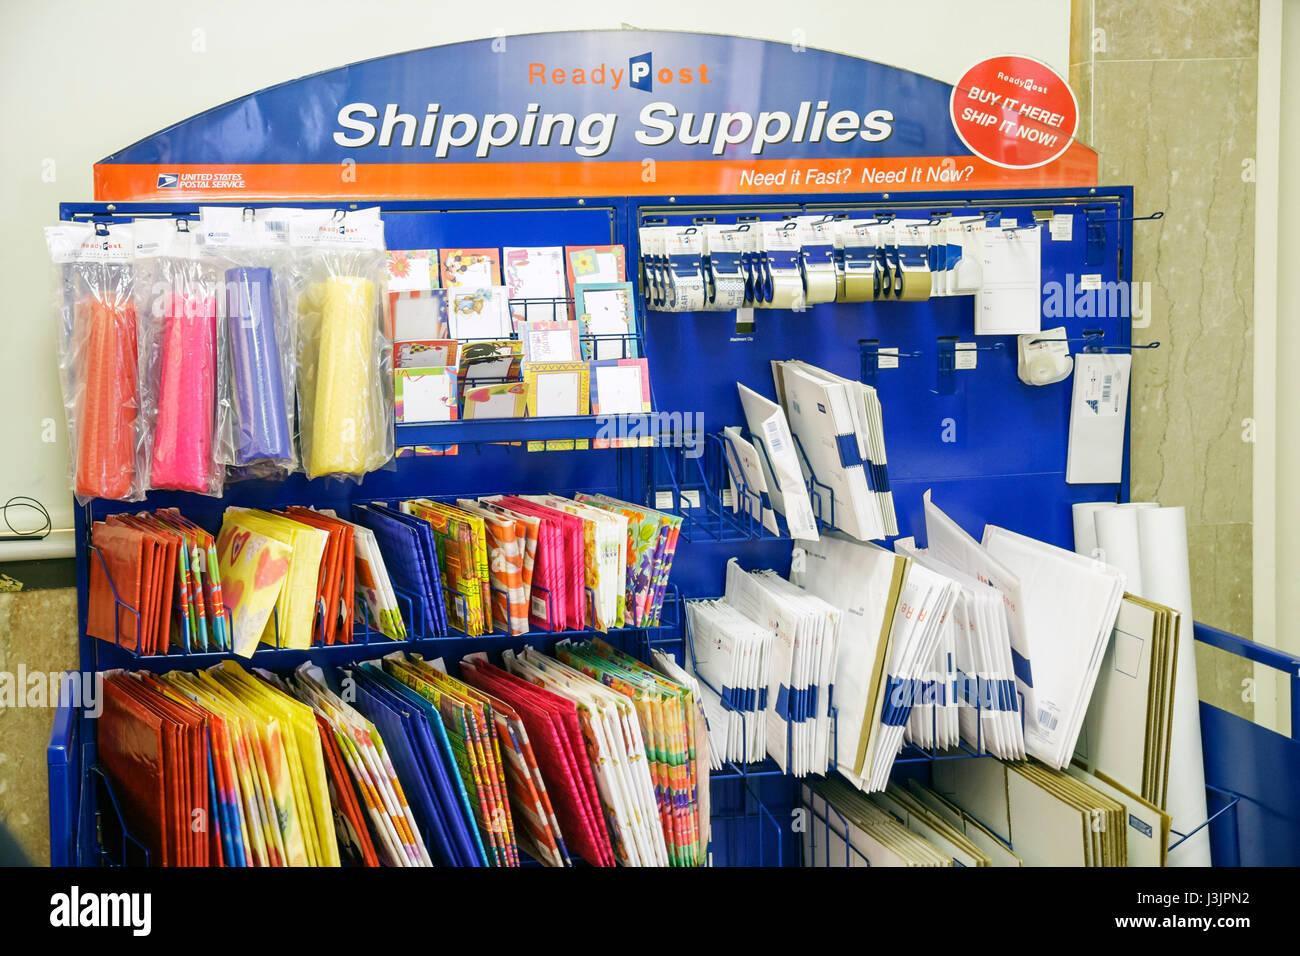 Us Postal Service Stock Photos & Us Postal Service Stock